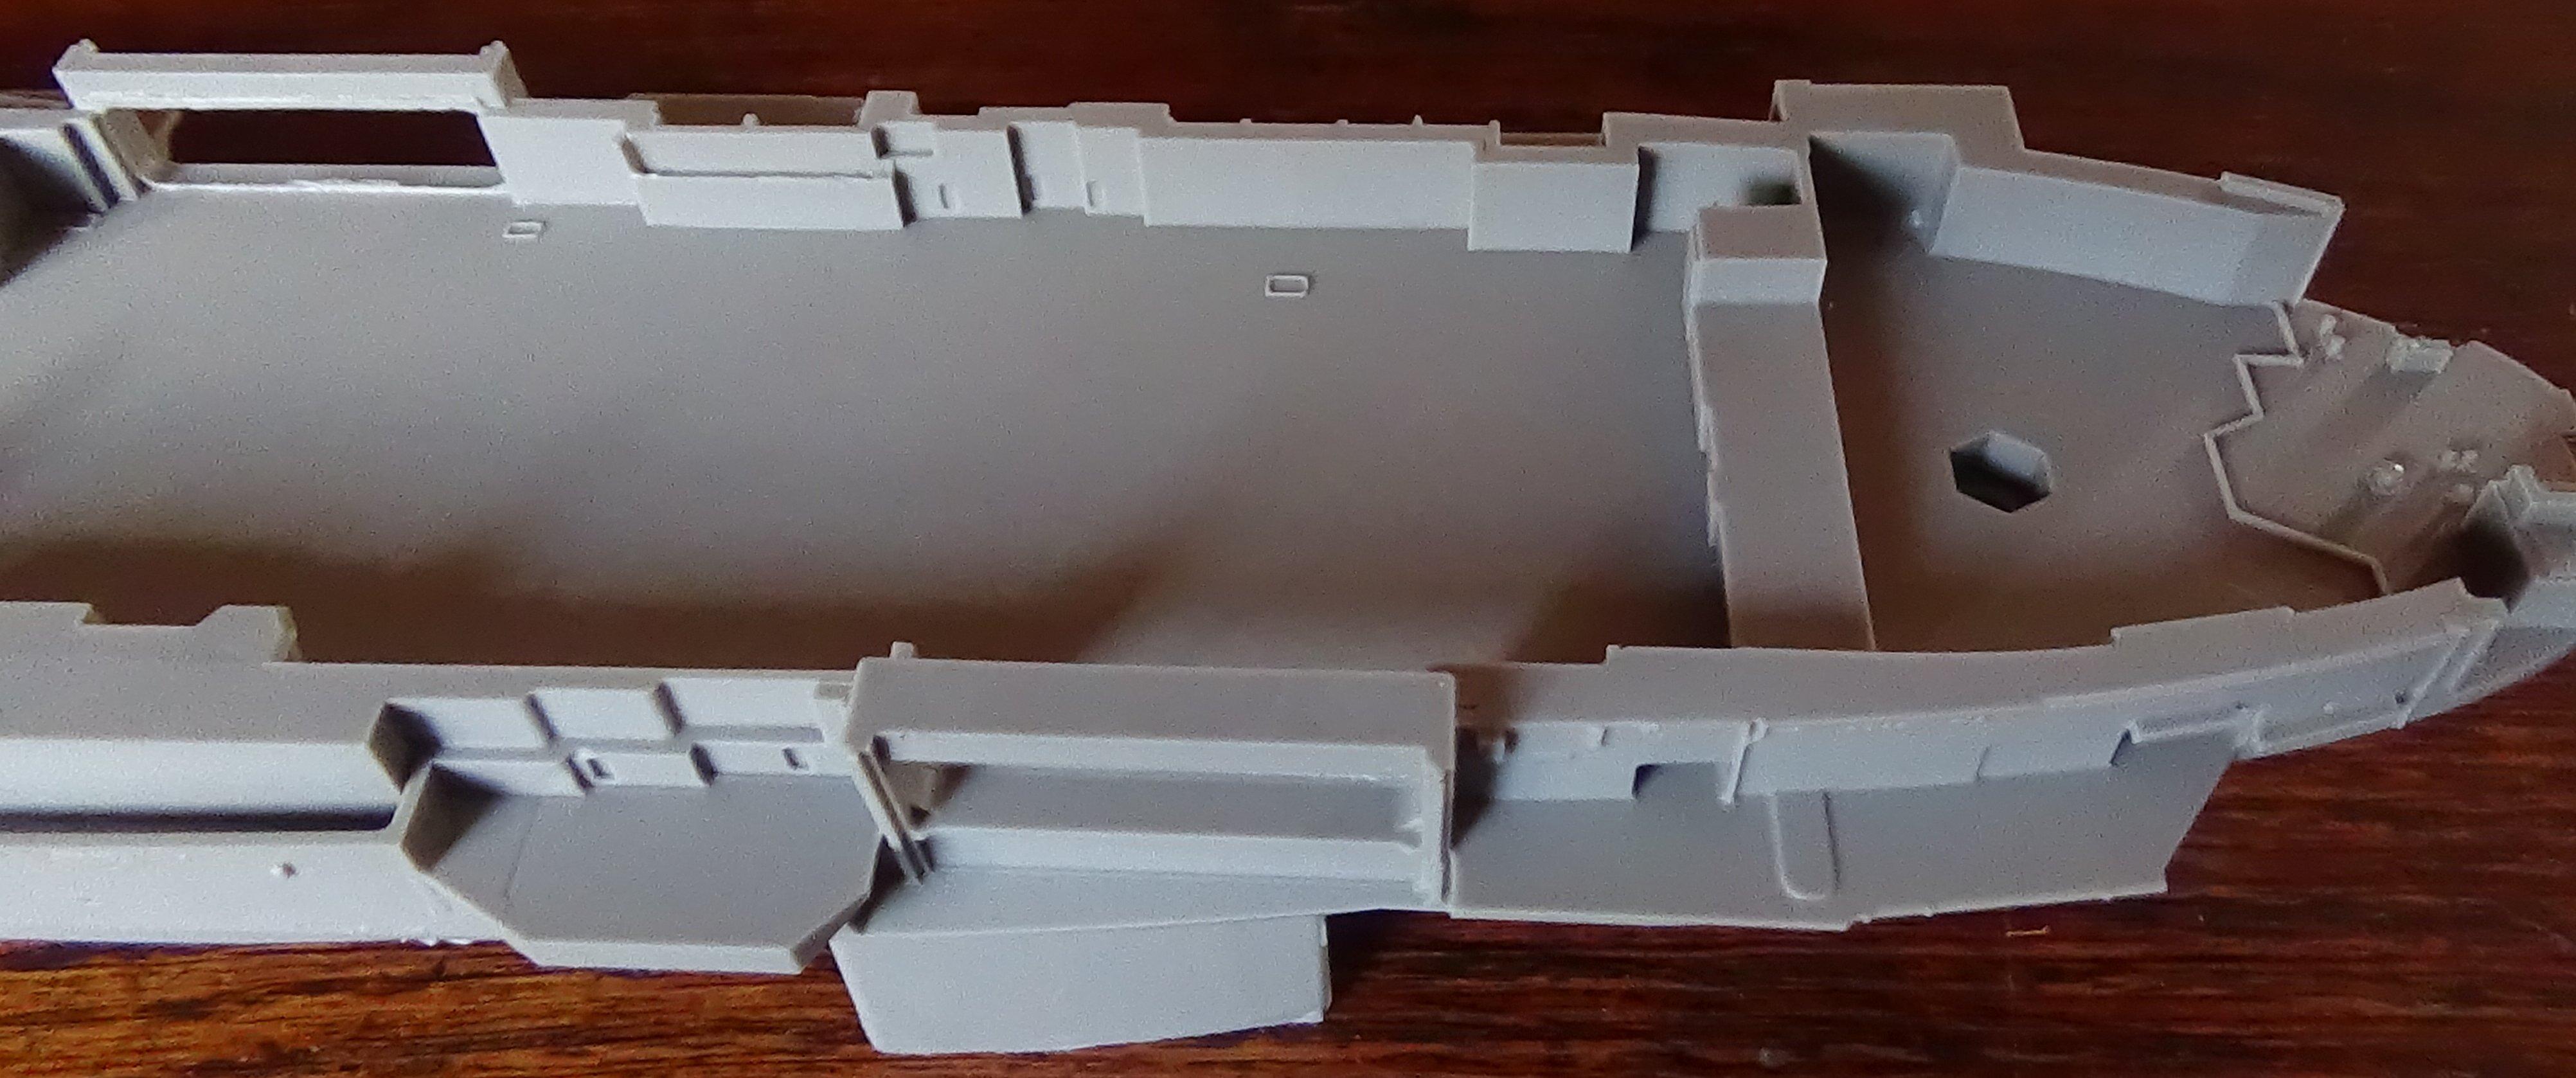 [USS Midway CVA-41] Porte avions lourd américain-700e-Orange Hobby 17071905040923134915155997